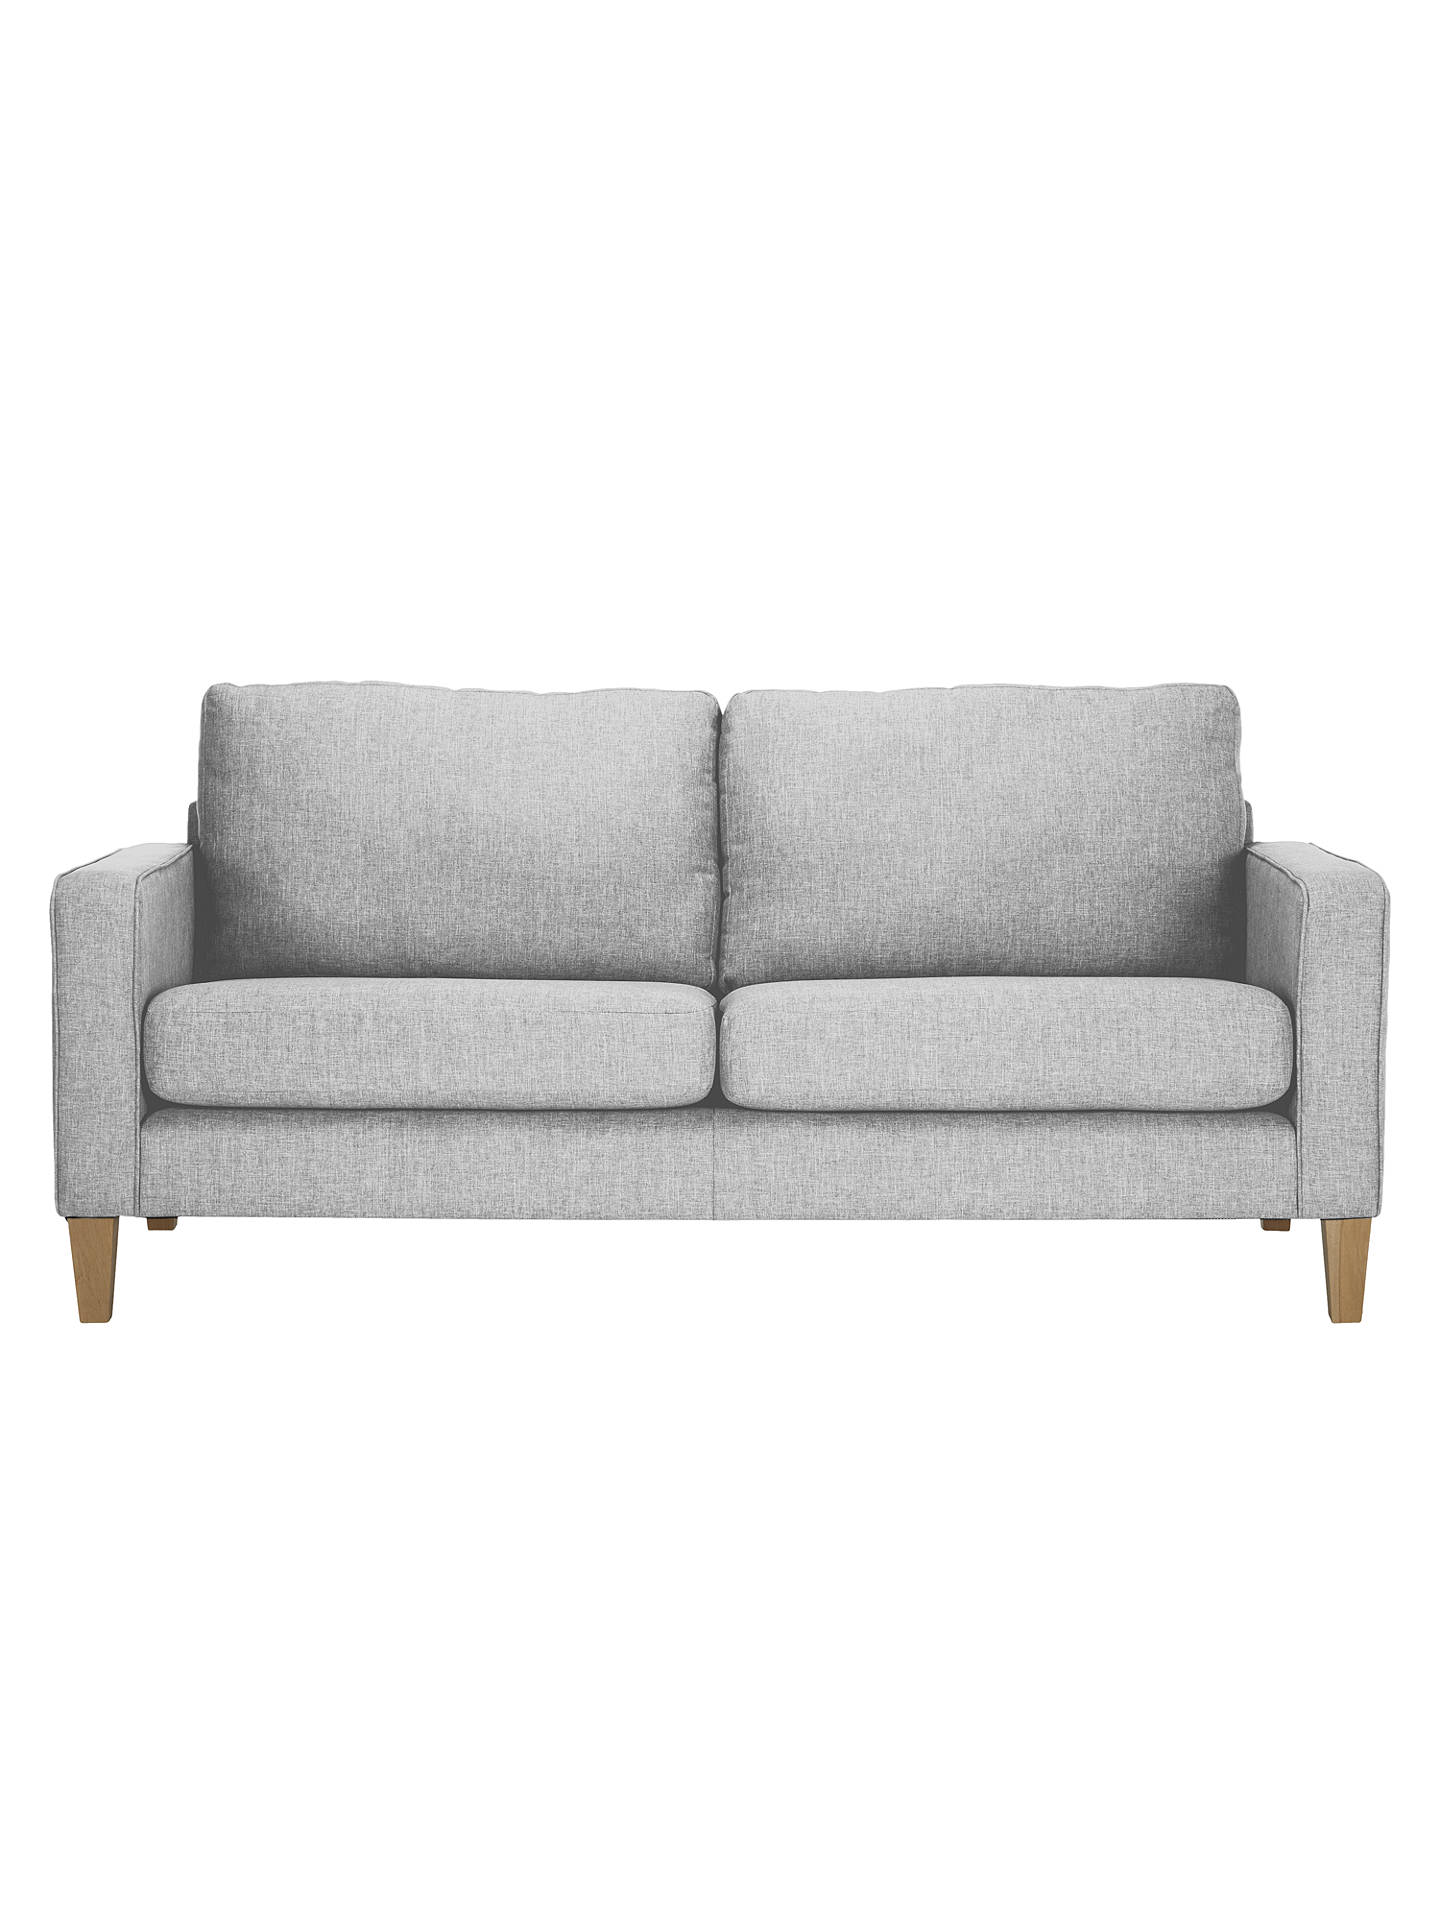 Superb John Lewis The Basics Jackson Large 3 Seater Sofa At John Ibusinesslaw Wood Chair Design Ideas Ibusinesslaworg